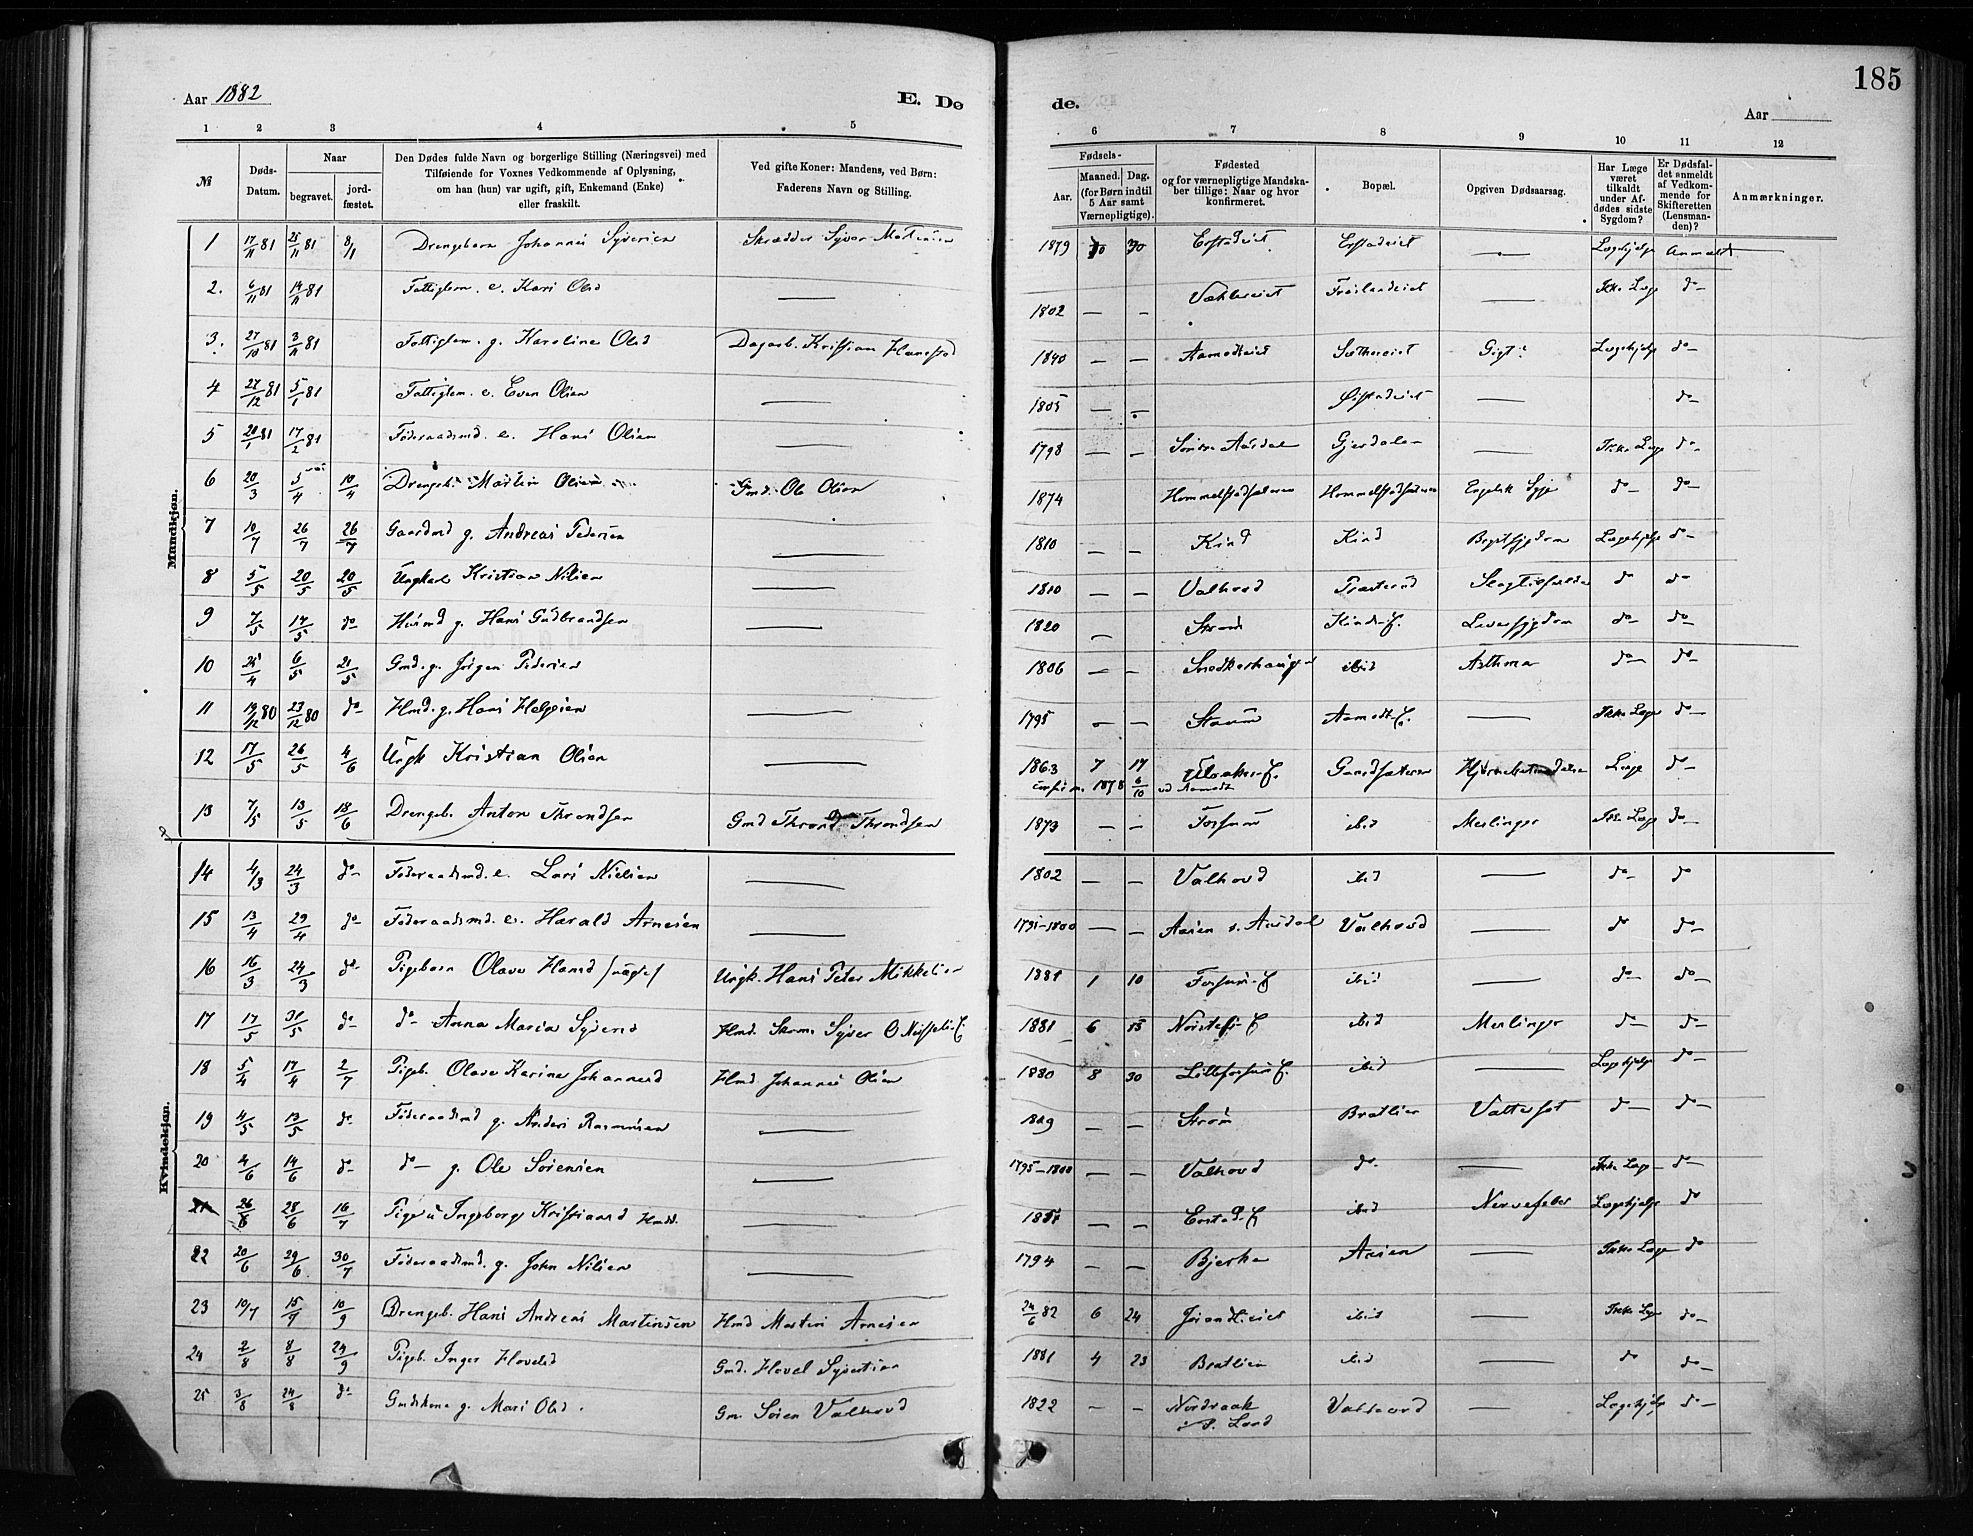 SAH, Nordre Land prestekontor, Ministerialbok nr. 4, 1882-1896, s. 185